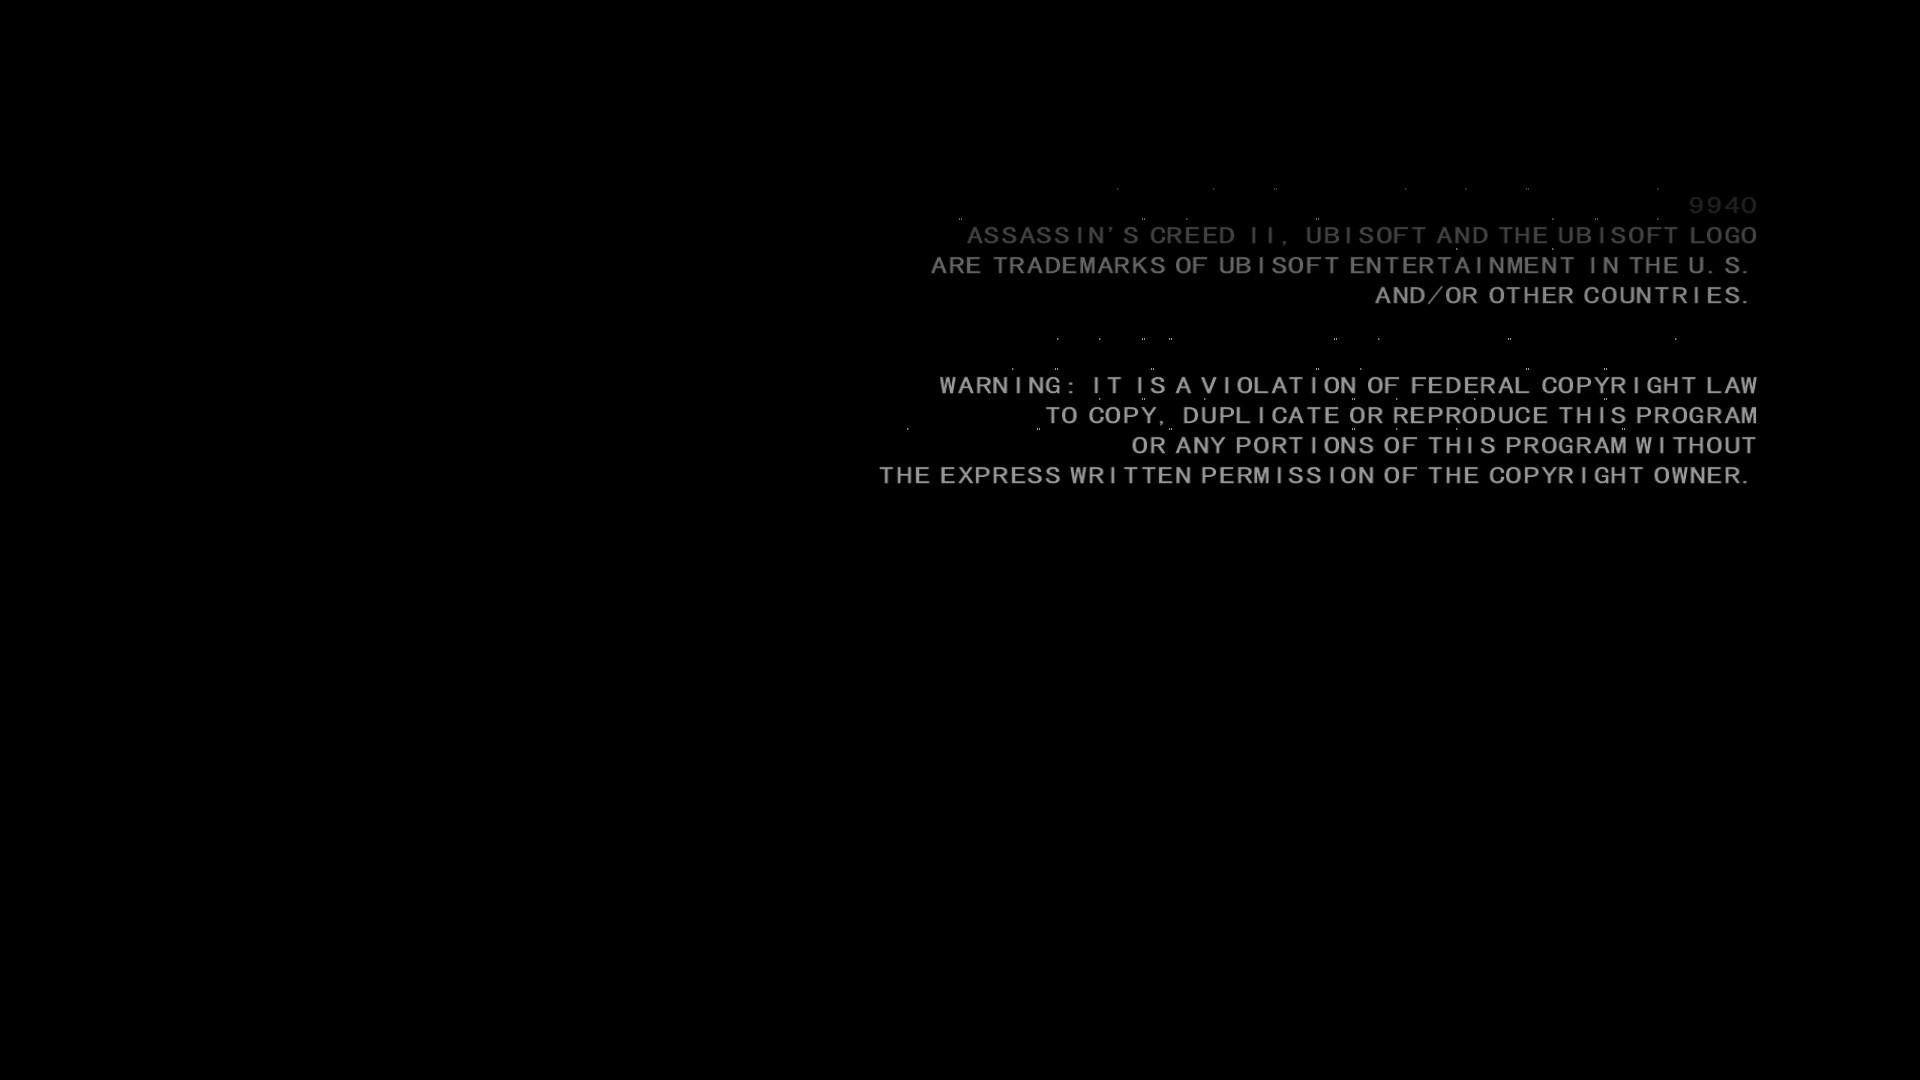 Assassin's Creed II2015-12-30-23-2-55.jpg